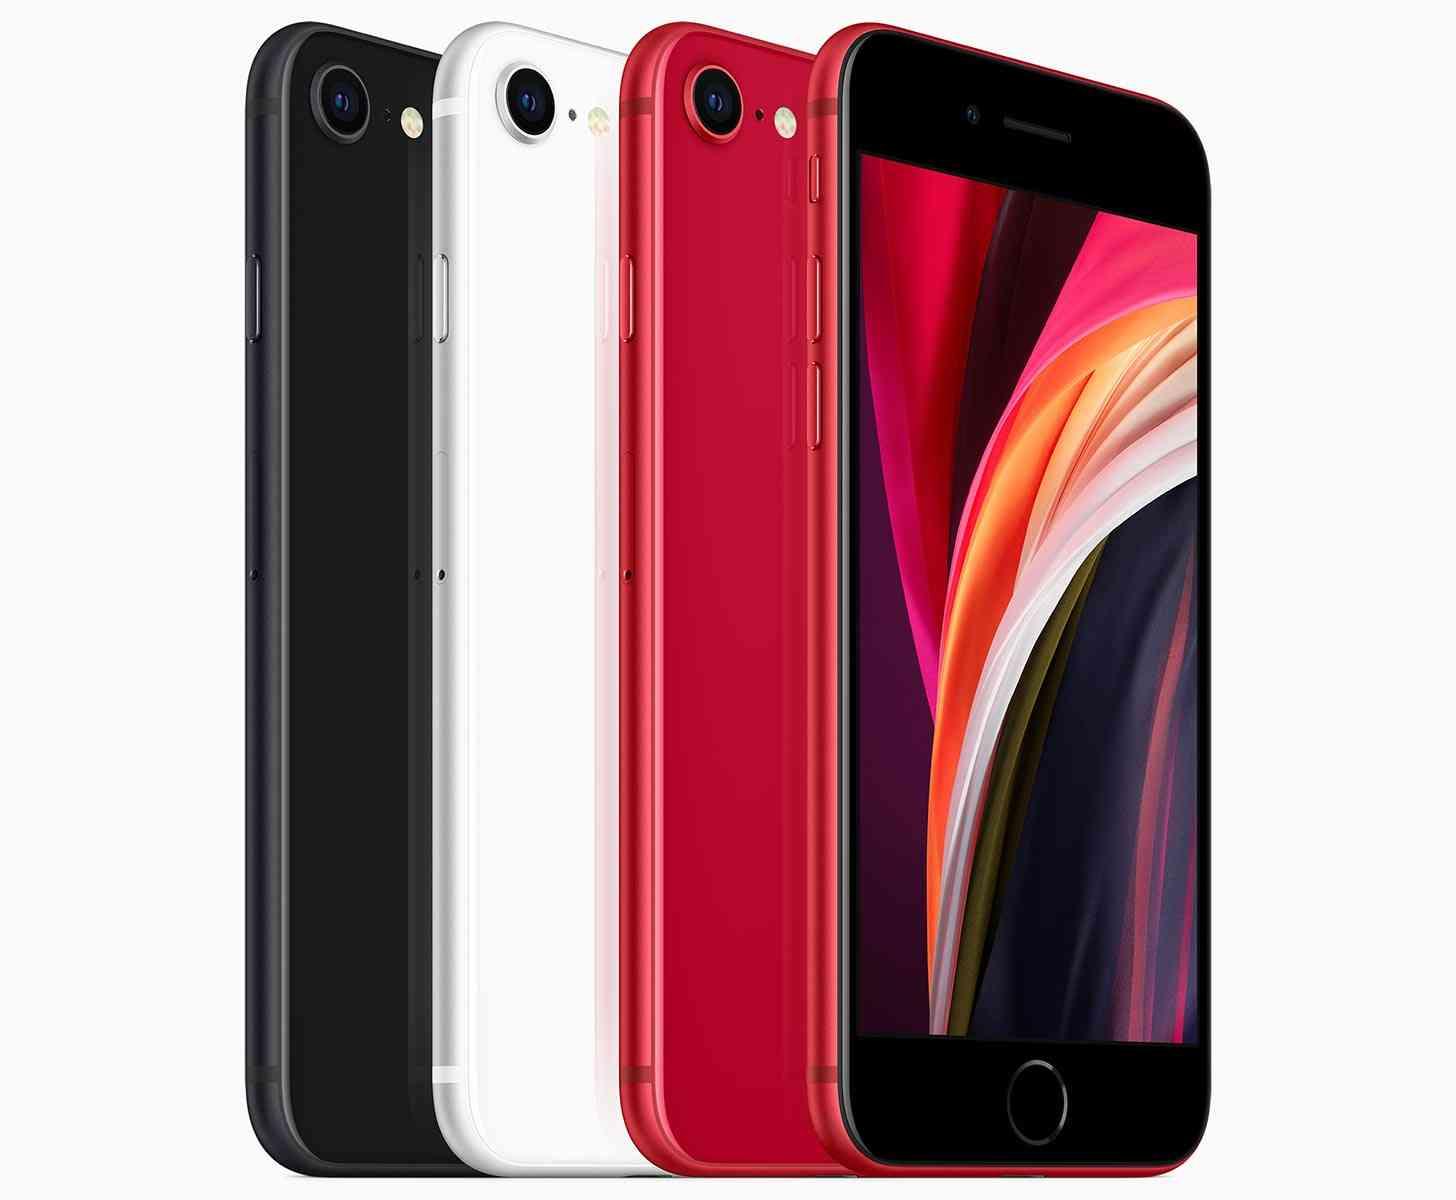 iPhone SE 2020 colors